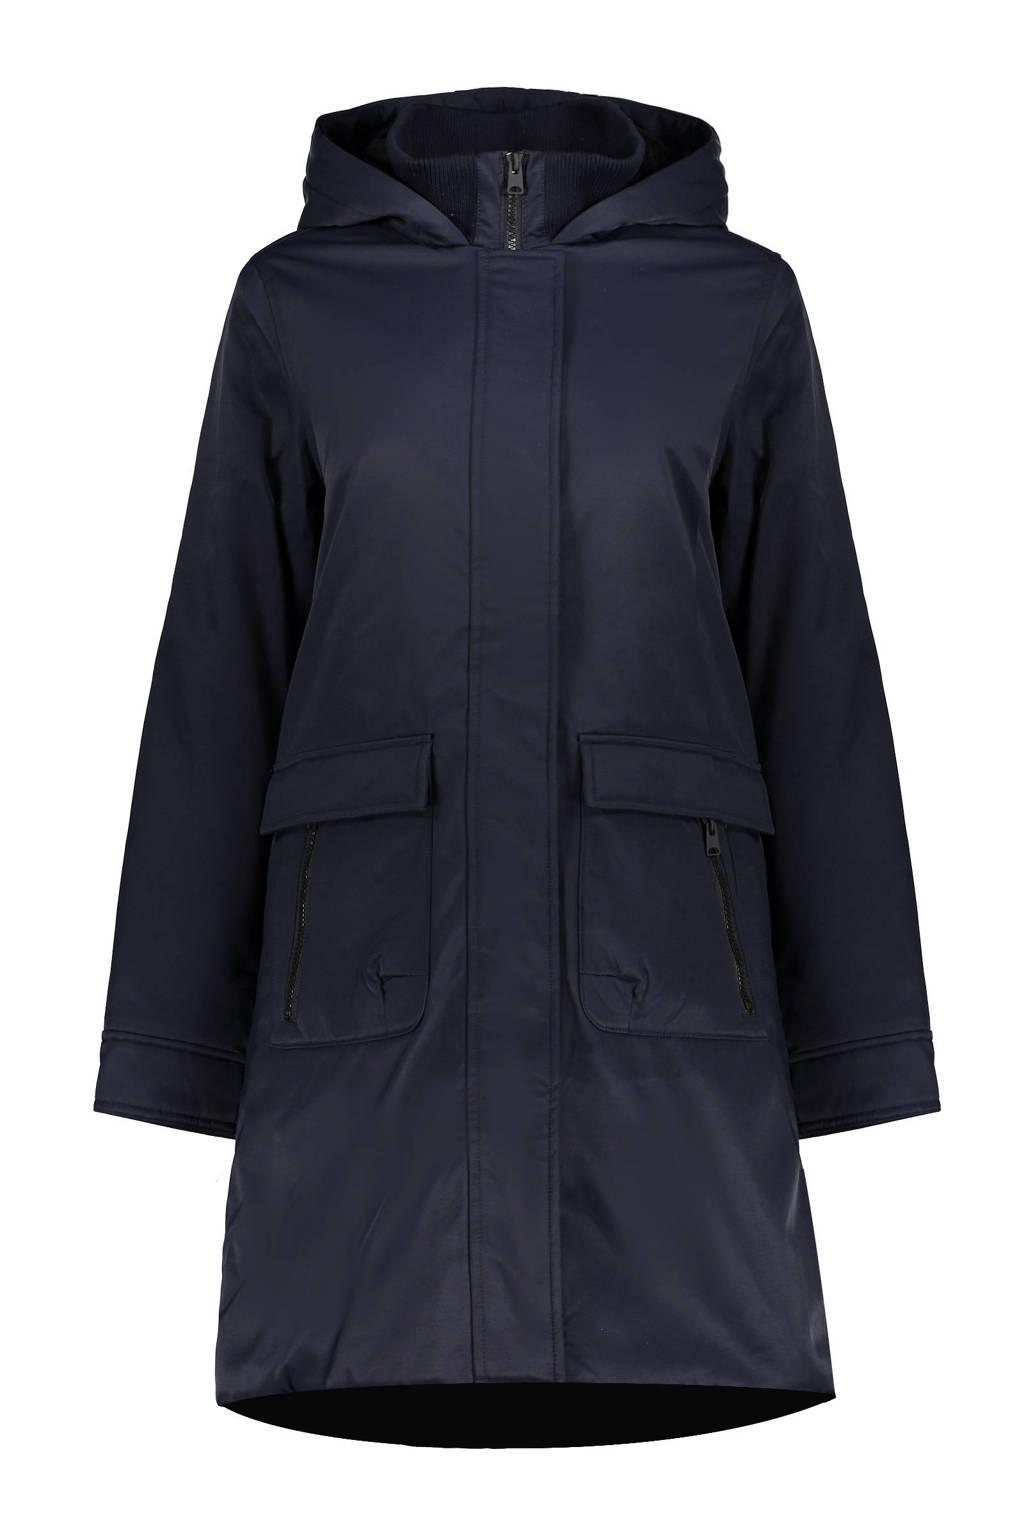 Geisha gewatteerde jas donkerblauw, Donkerblauw